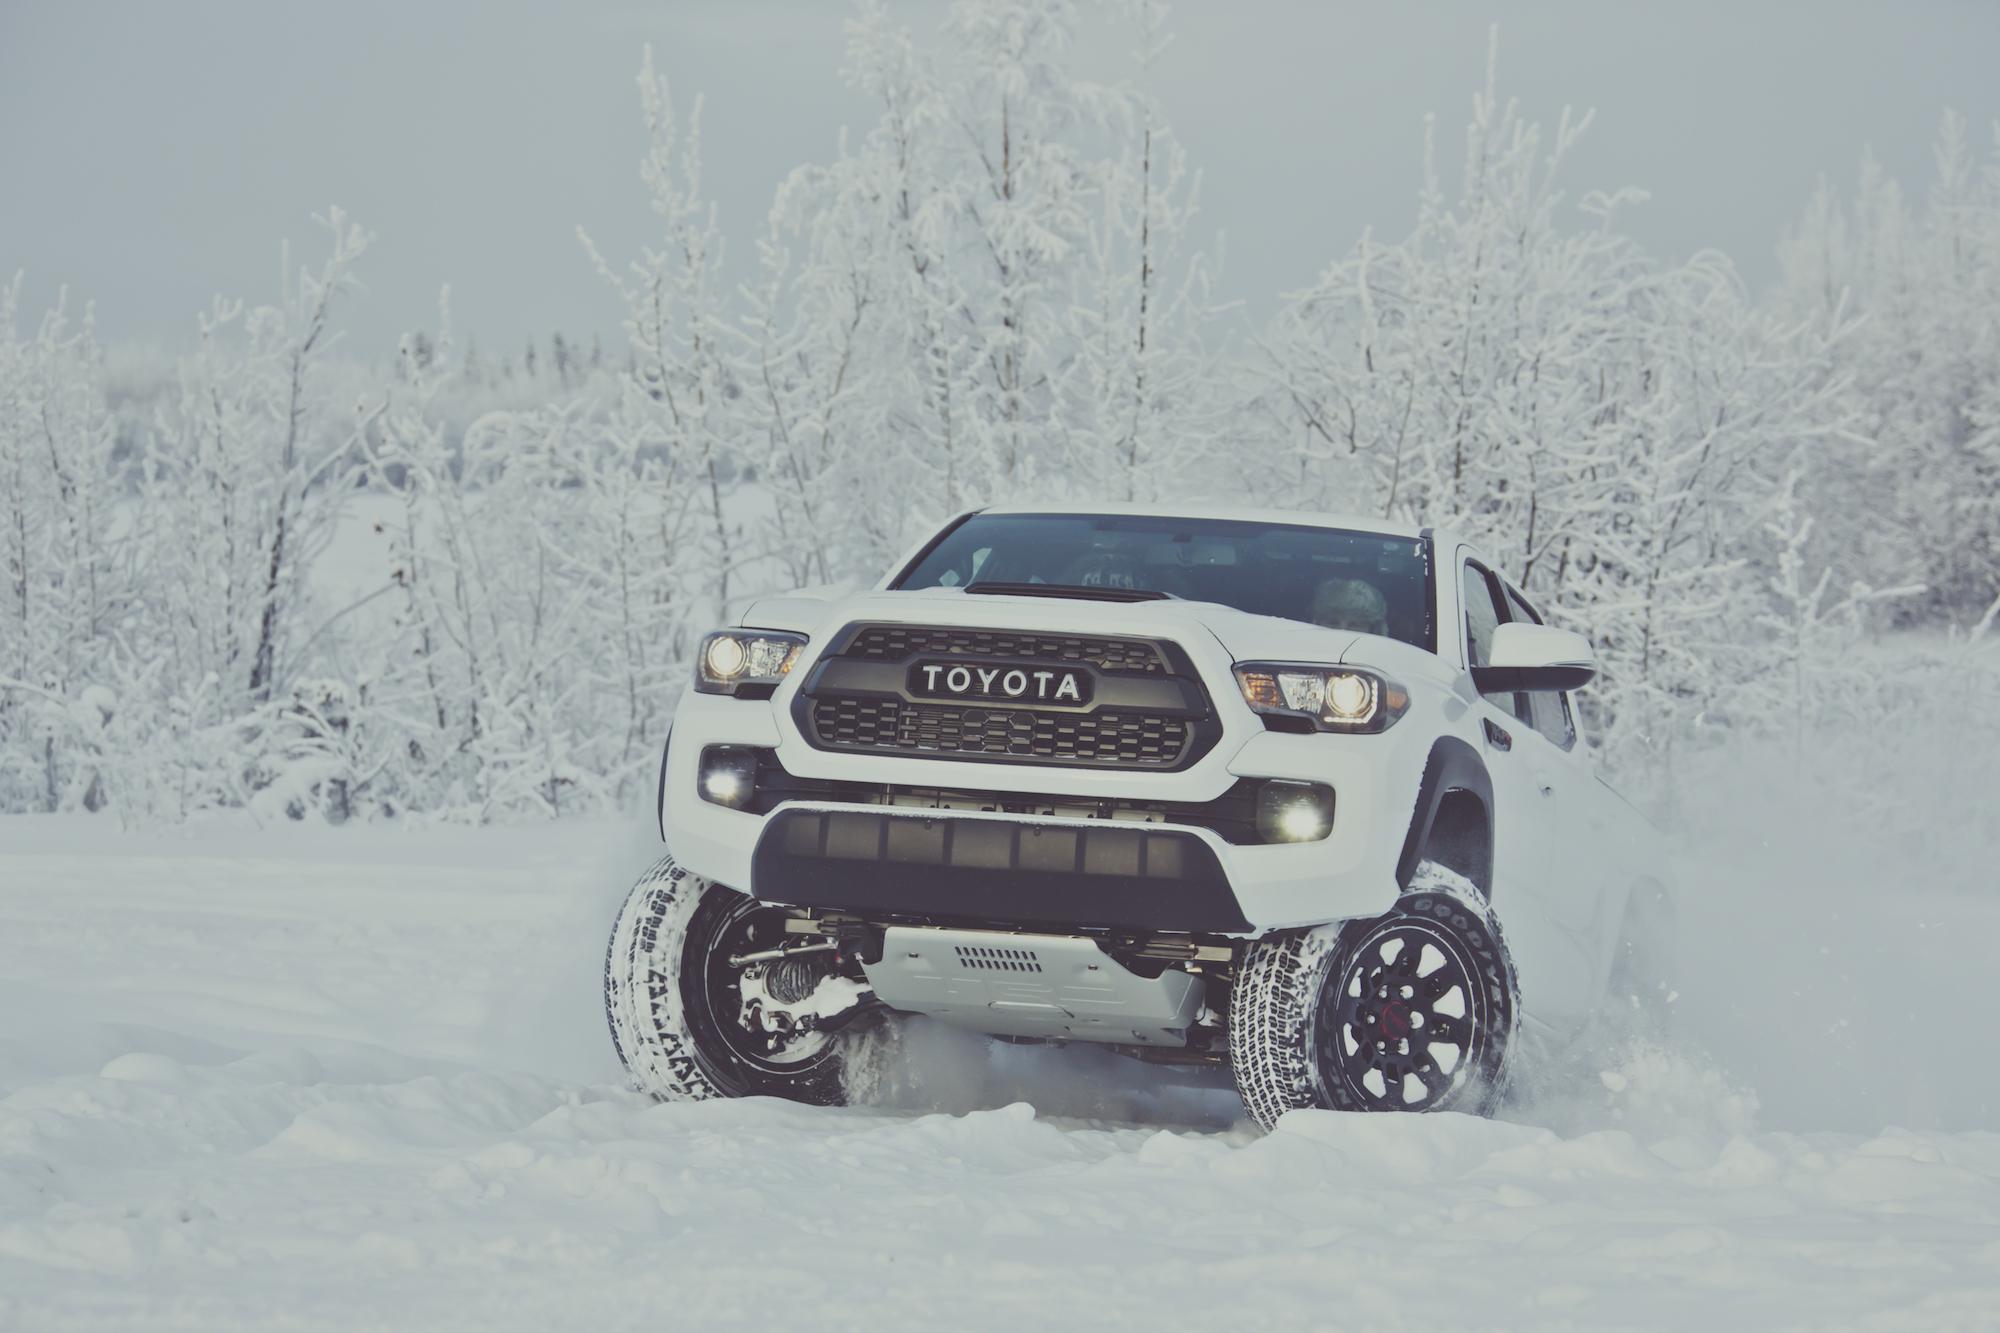 2017 Nissan Frontier vs 2017 Toyota Ta a pare Trucks